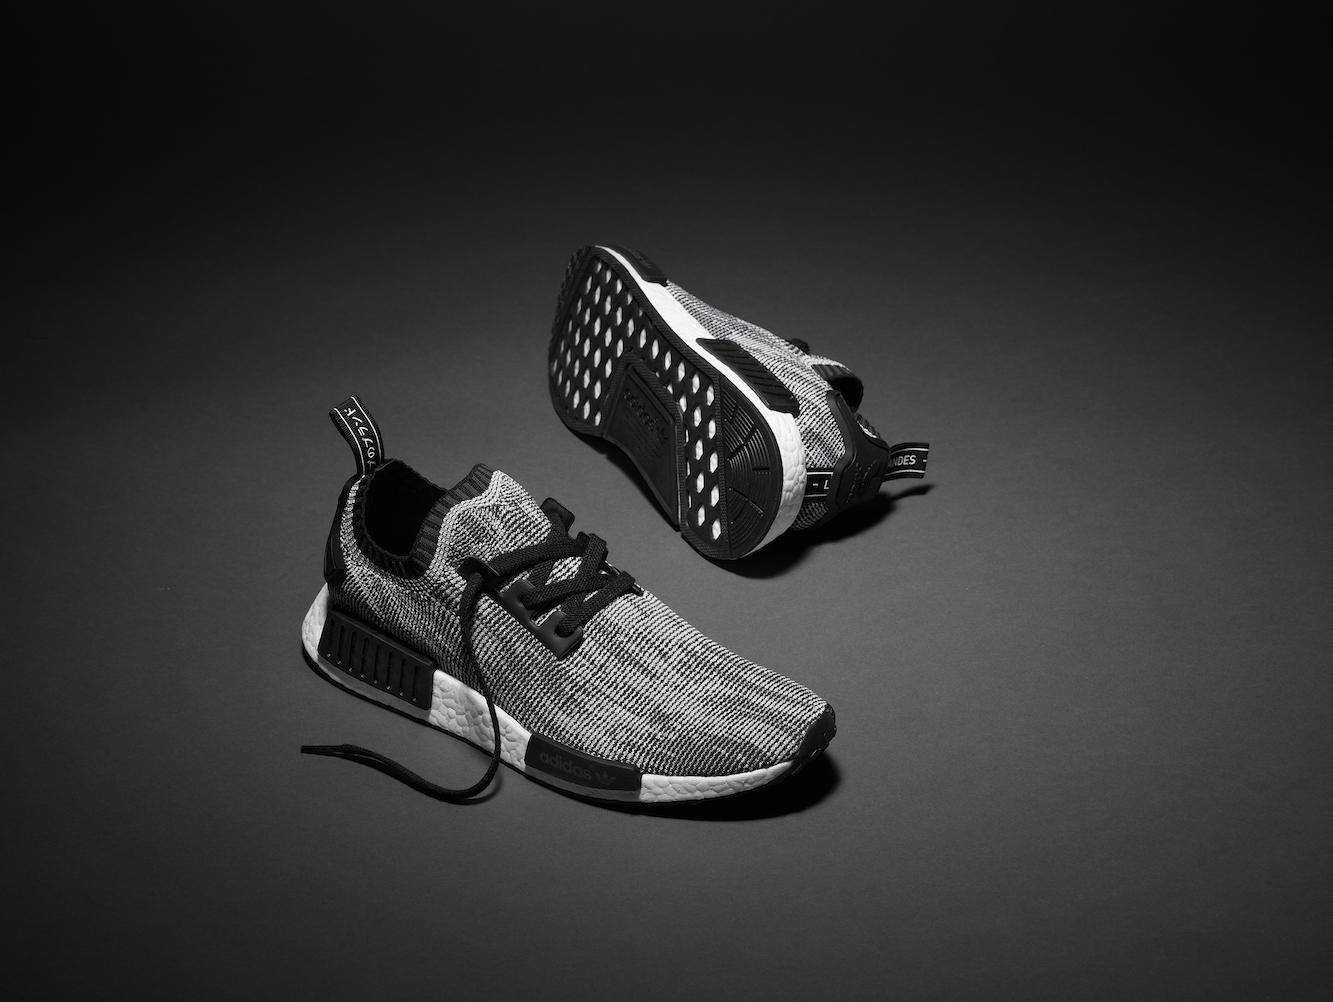 Adidas Boost Nmd Runner